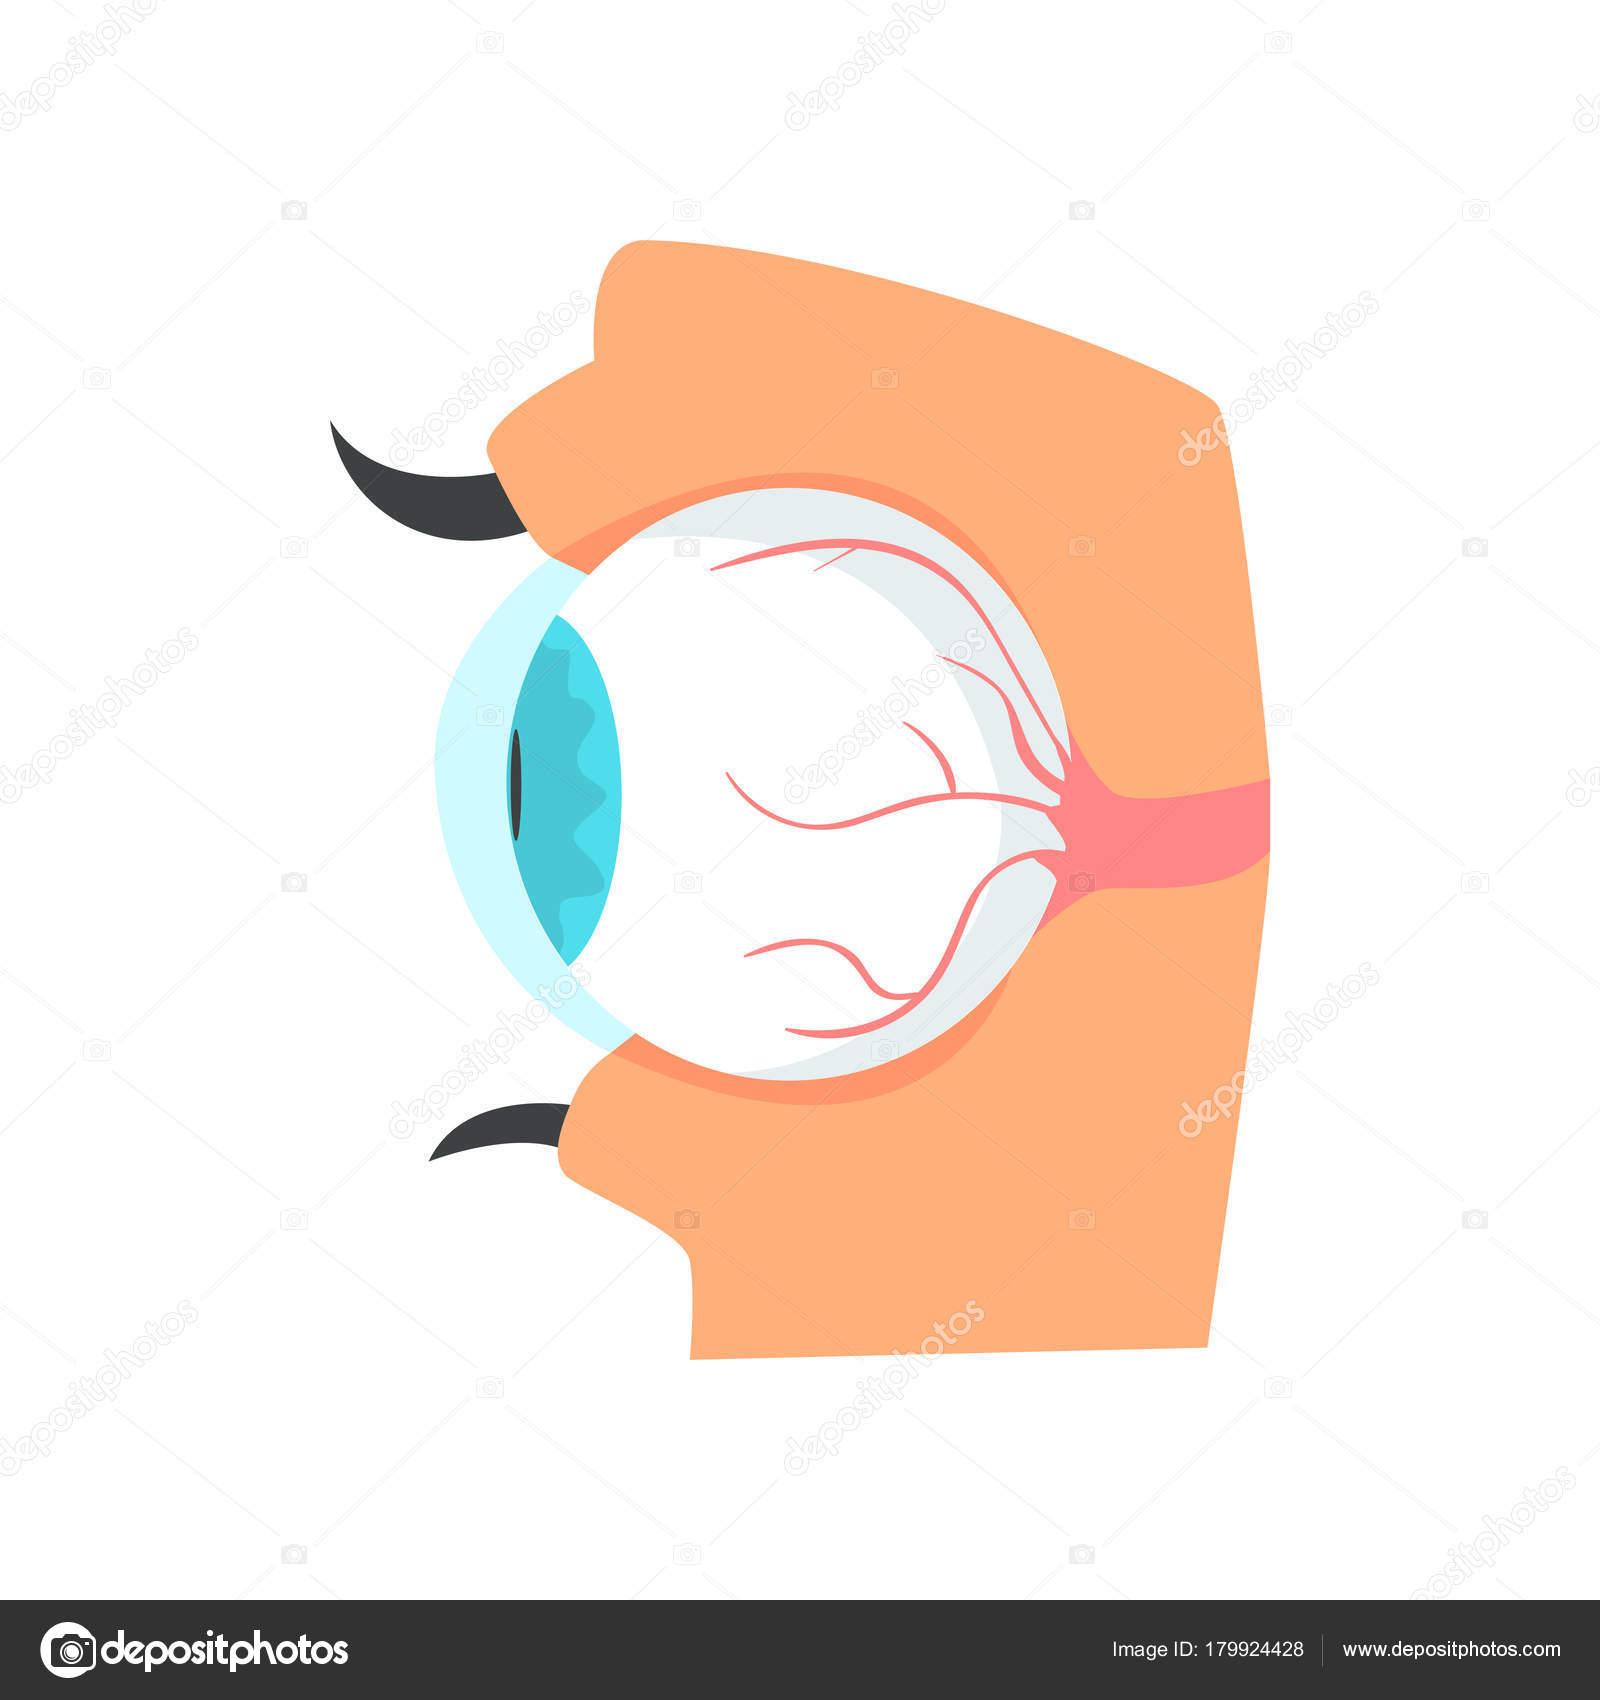 Globo ocular, anatomía de dibujos animados de ojo humano vector ...